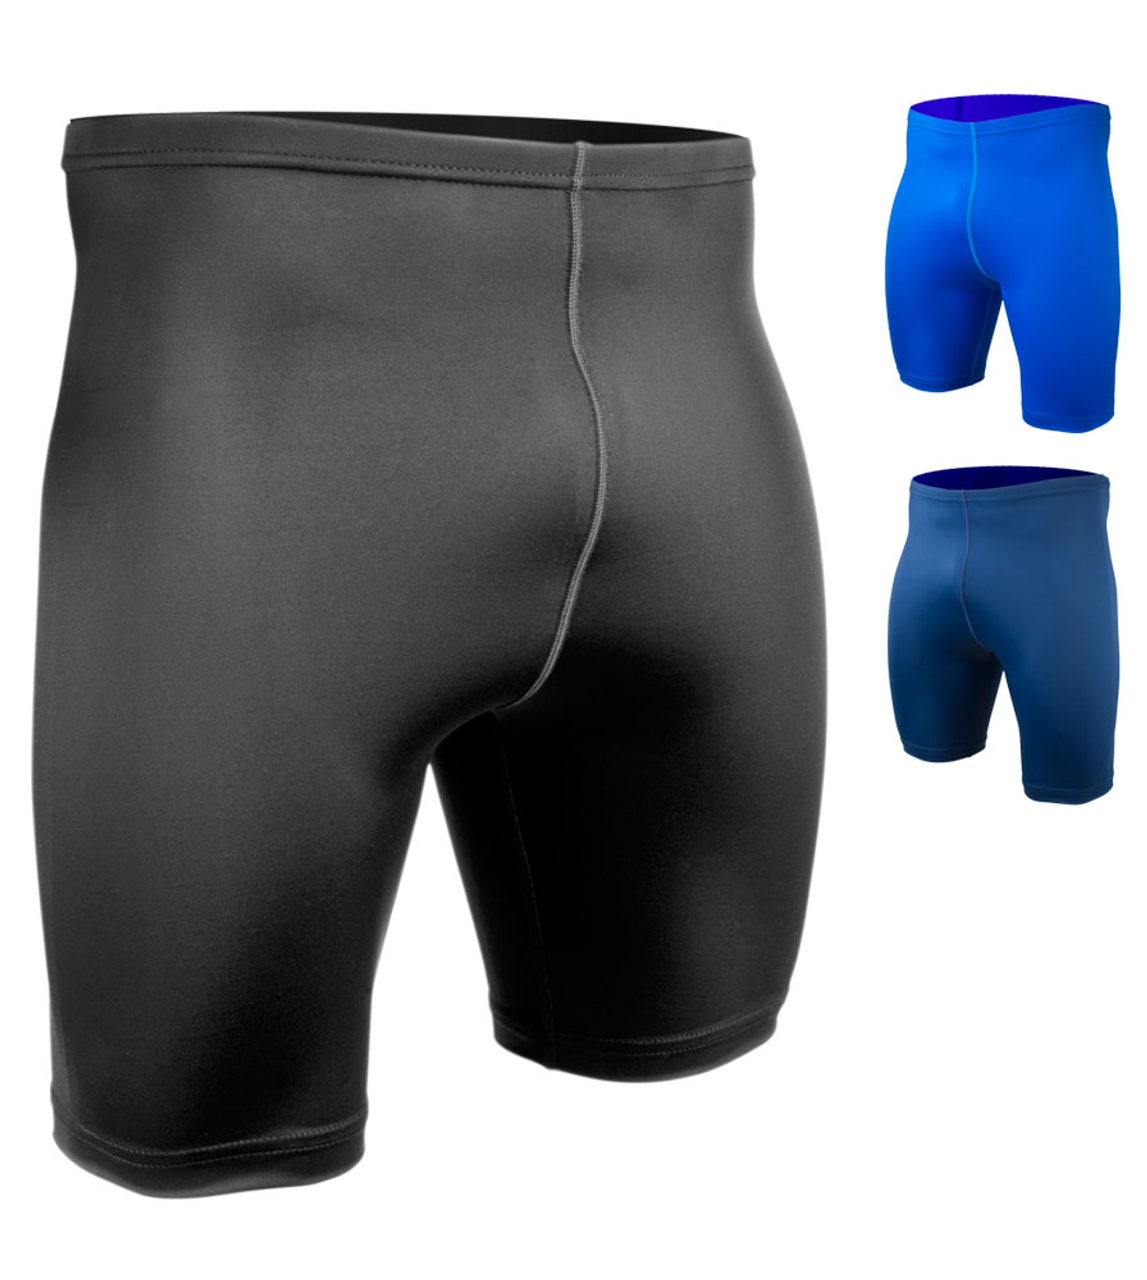 d0ffa597c447 Aero Tech Big Men's Spandex Exercise Compression Workout Short · Big Size  compression workout shorts ...